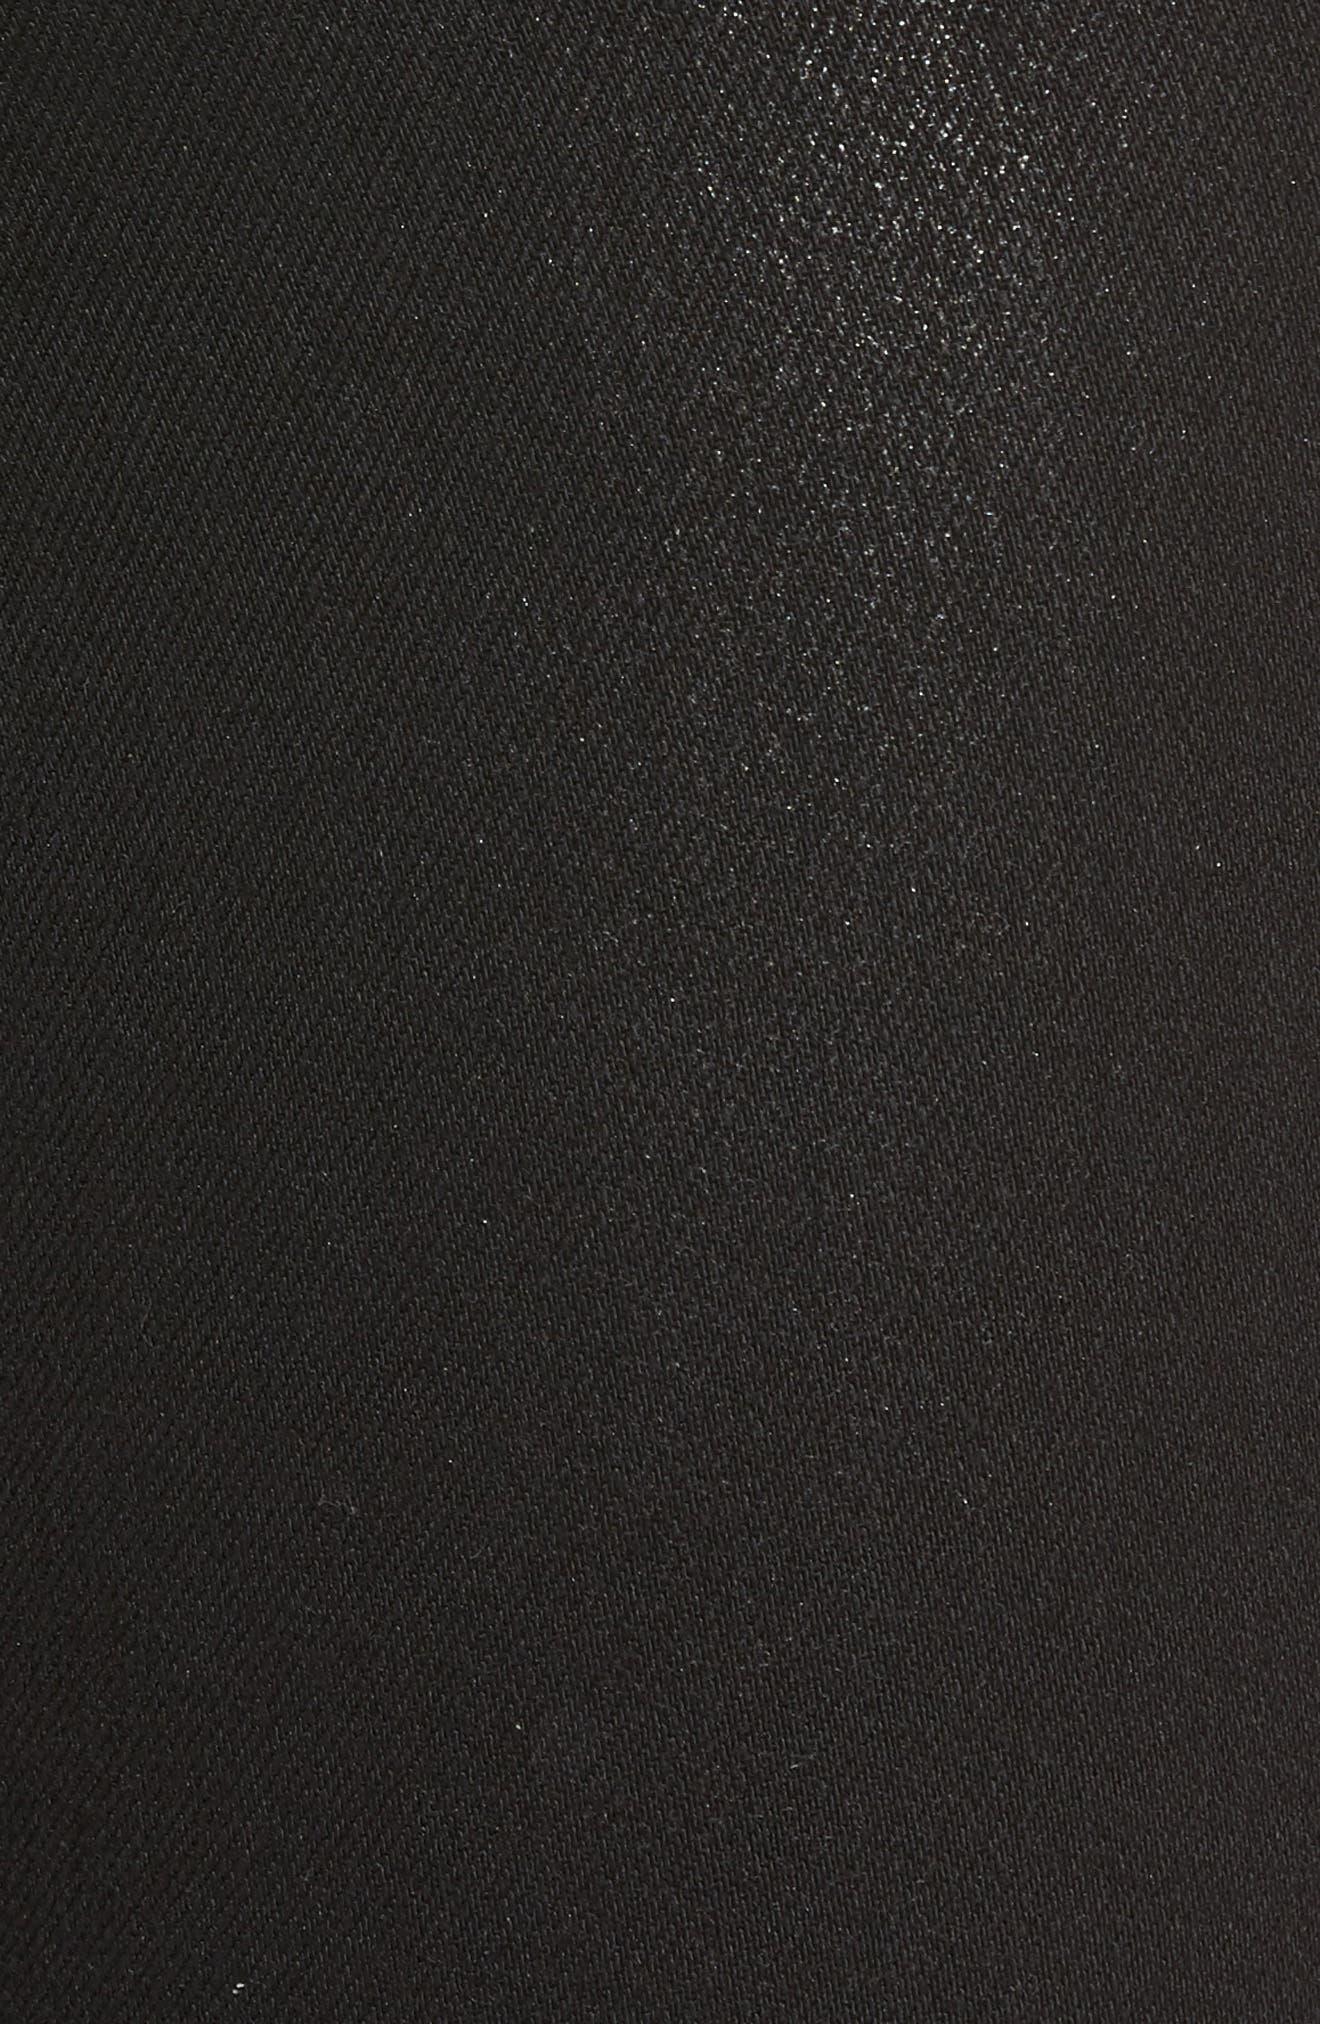 Kooper Coated Skinny Jeans,                             Alternate thumbnail 5, color,                             Black Coated